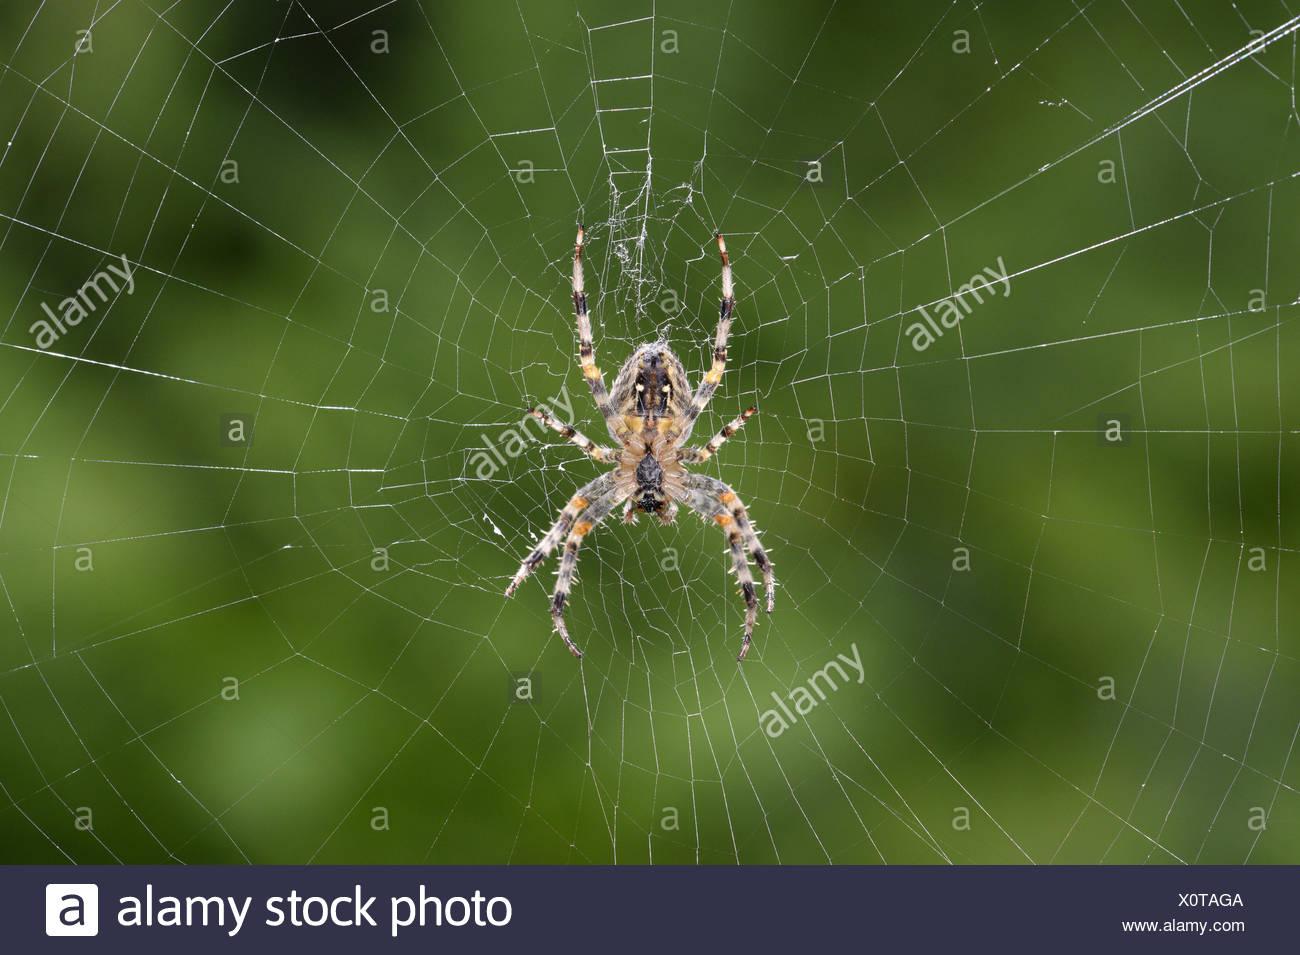 Garden Spider - Araneus diadematus in web - Stock Image